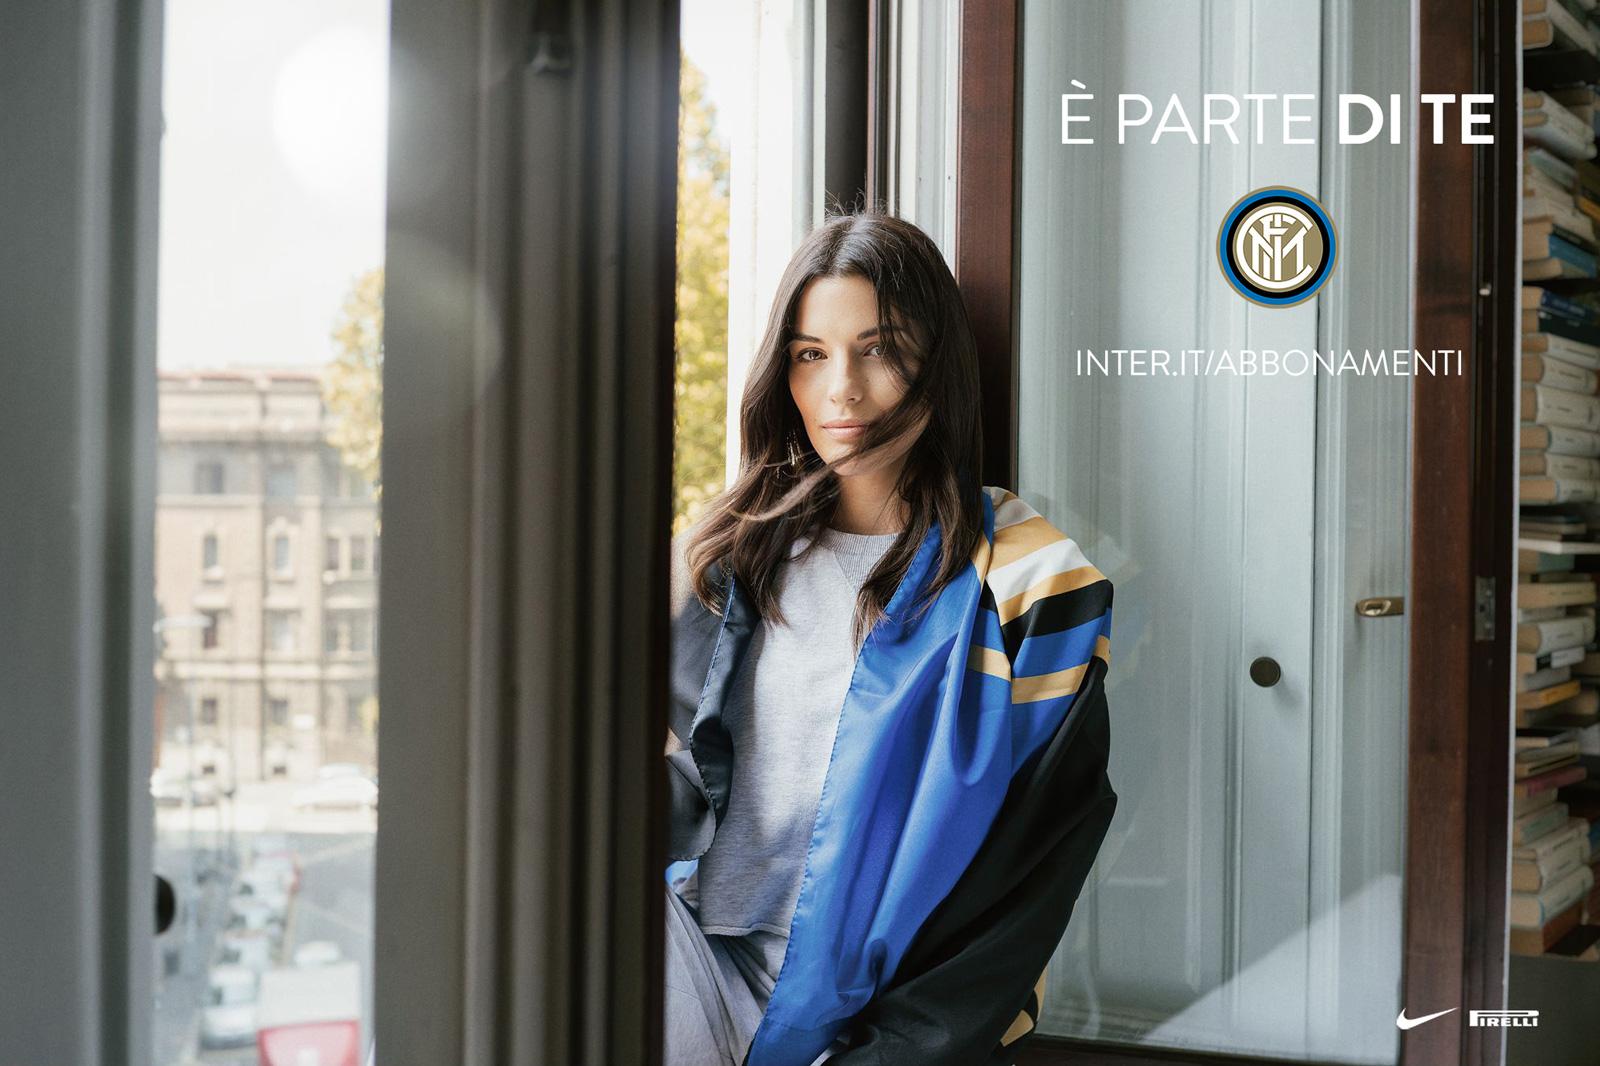 Inter1